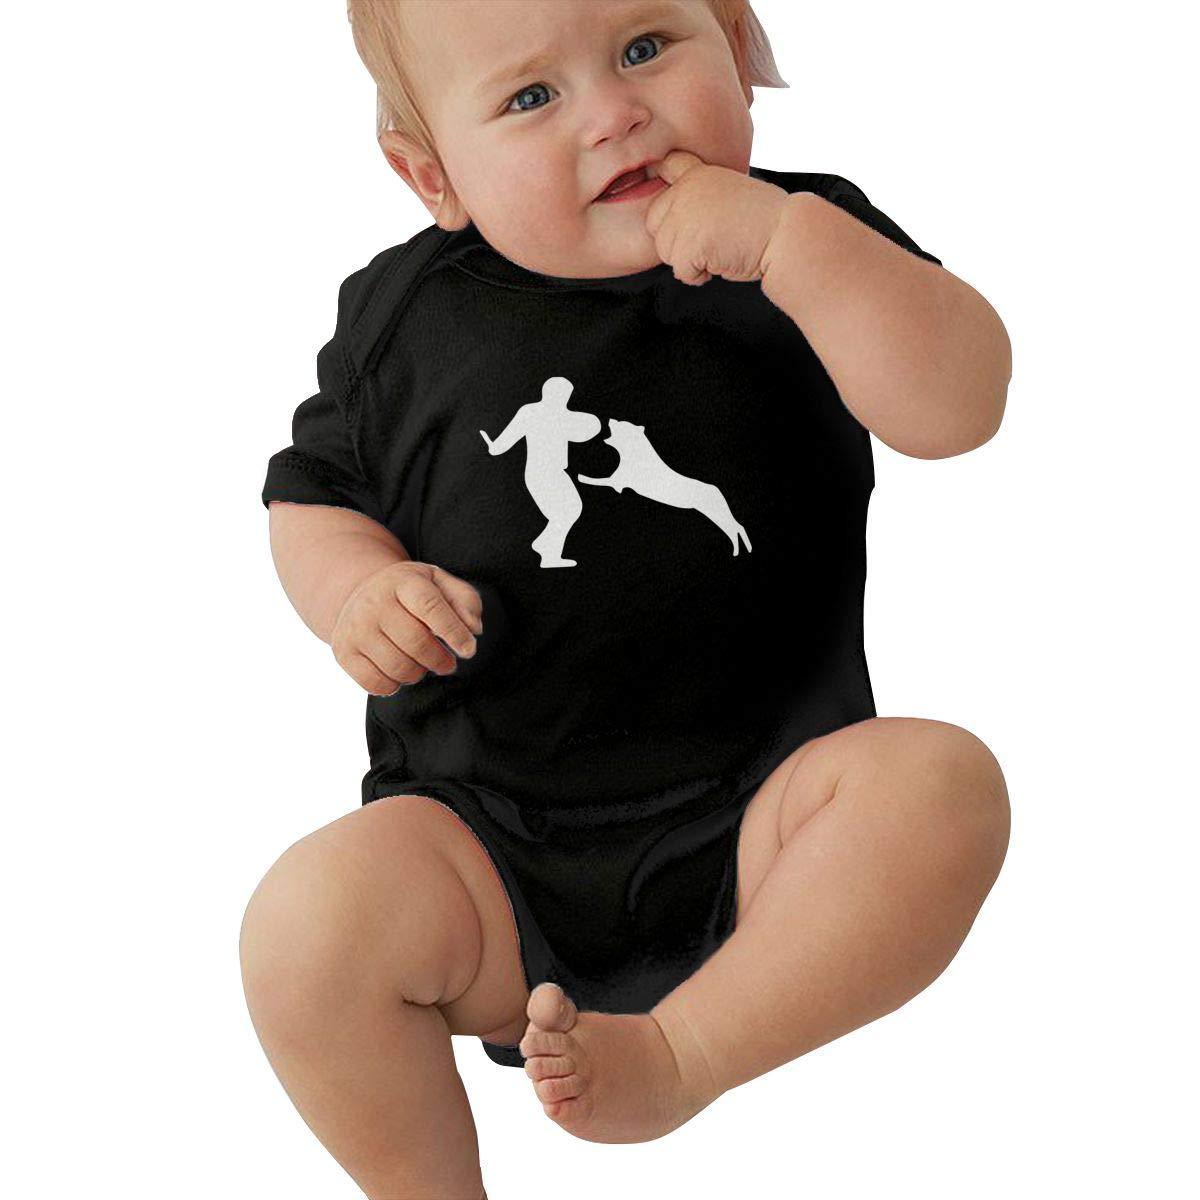 K-9 Protection Bite Work Rottweiler Silhouette1 Toddler Baby Girl Boy Bodysuit Jumpsuit Short Sleeve Bodysuit Tops Clothes